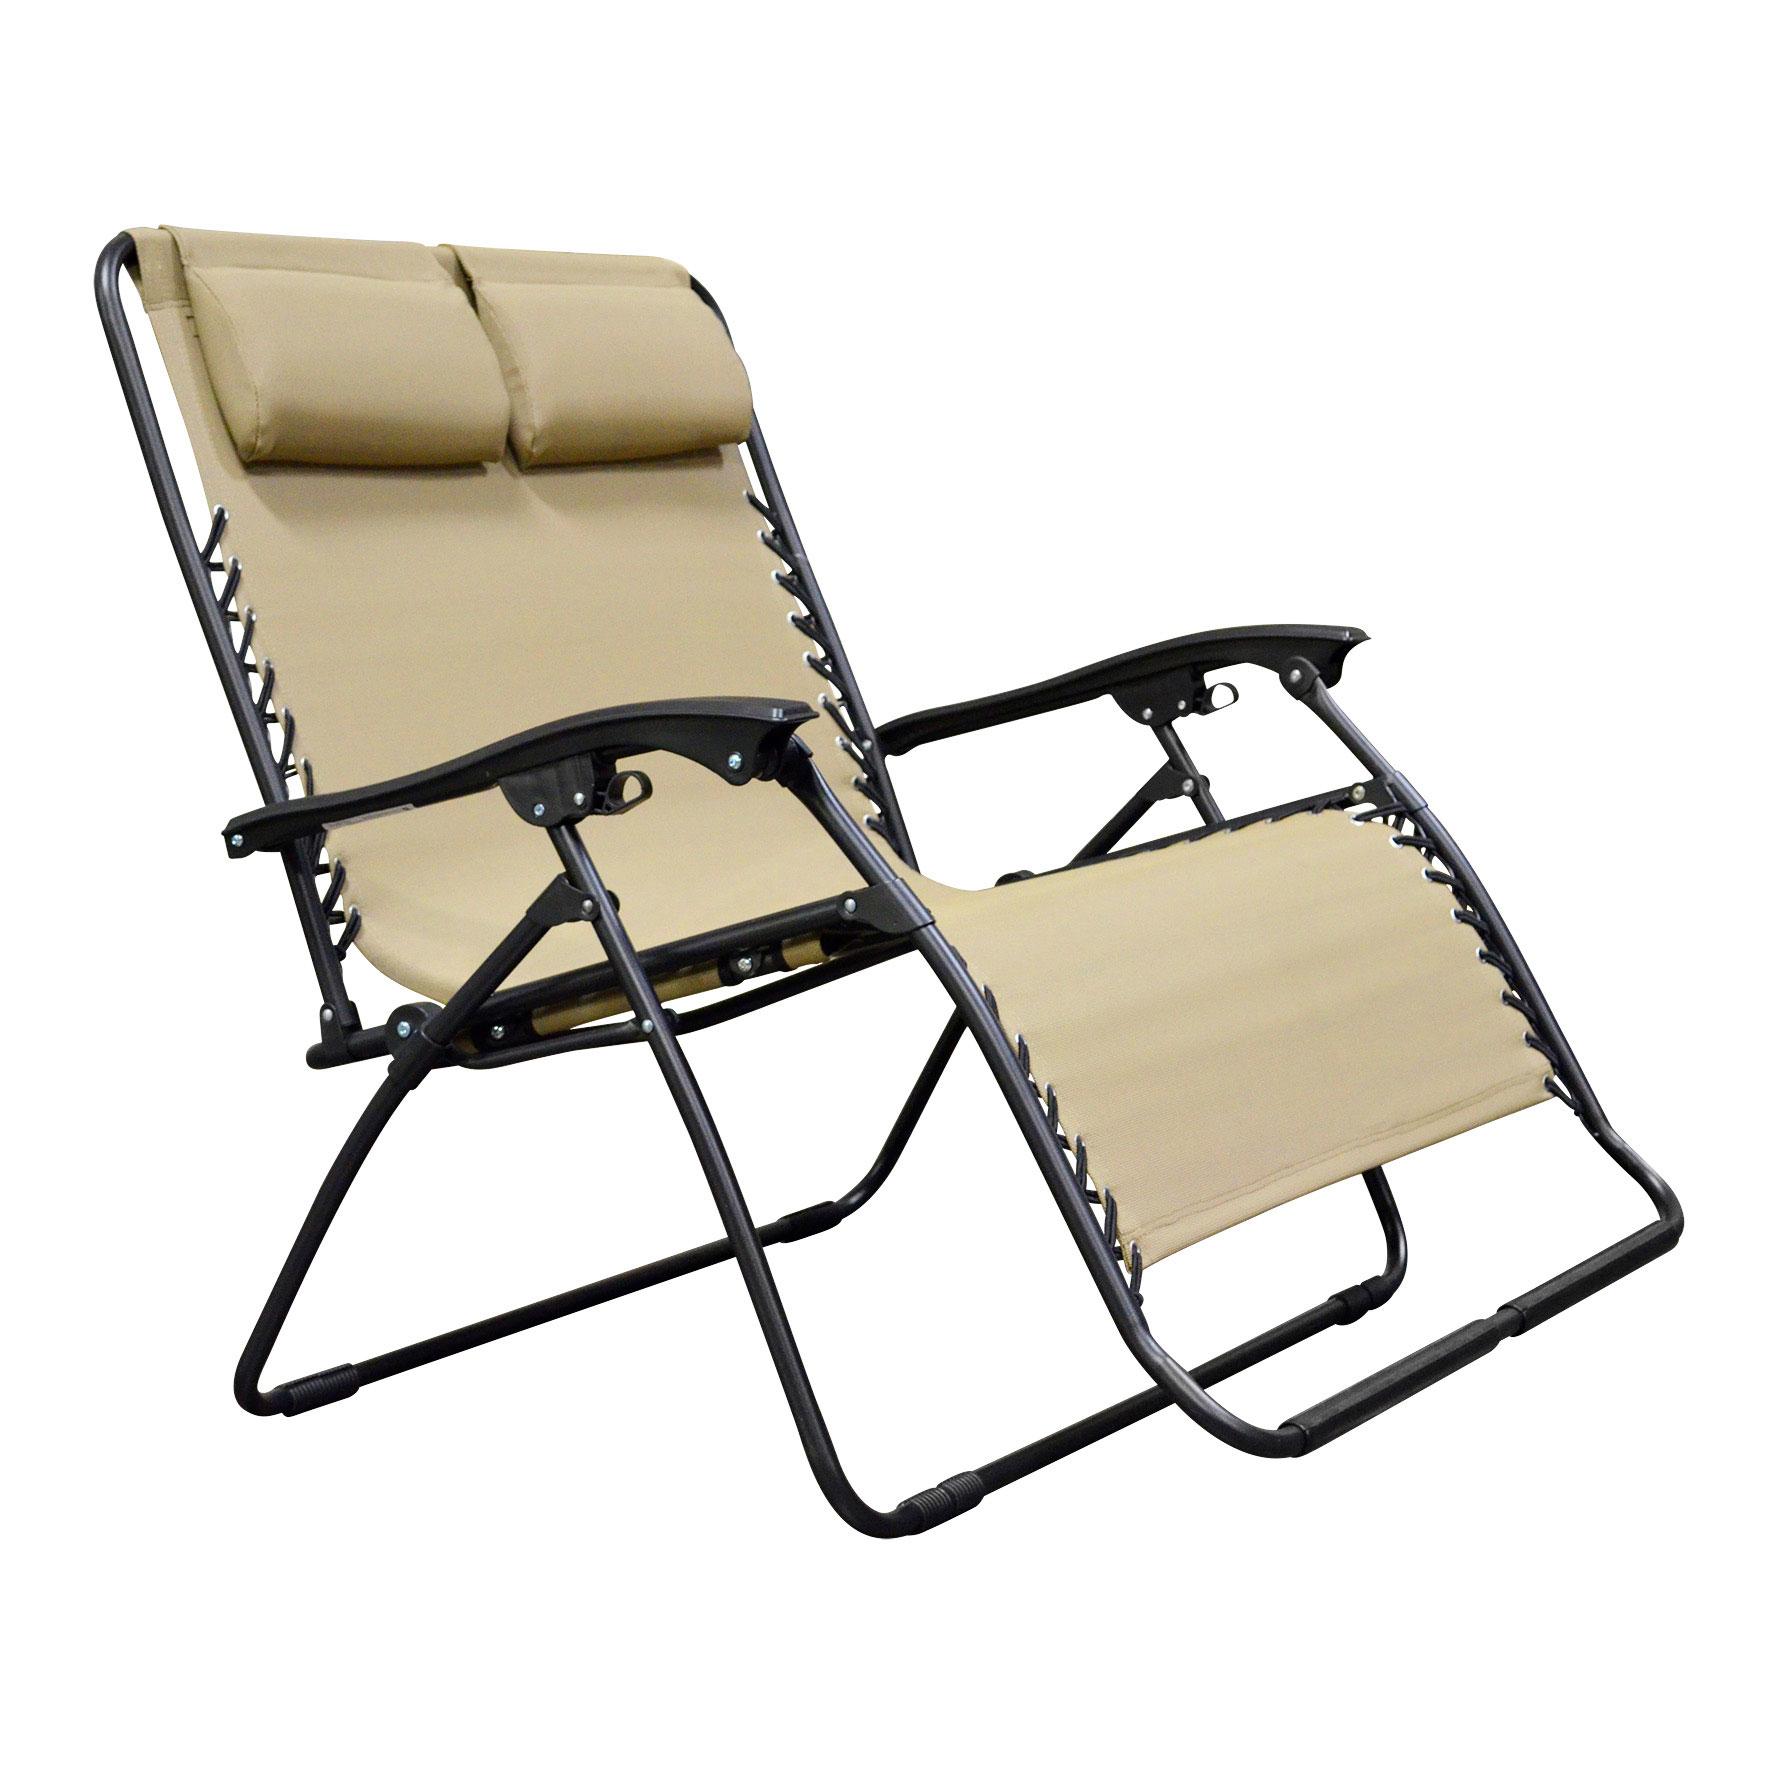 Caravan Canopy Infinity Zero Gravity Loveseat Steel Frame Patio Deck Lawn Chair